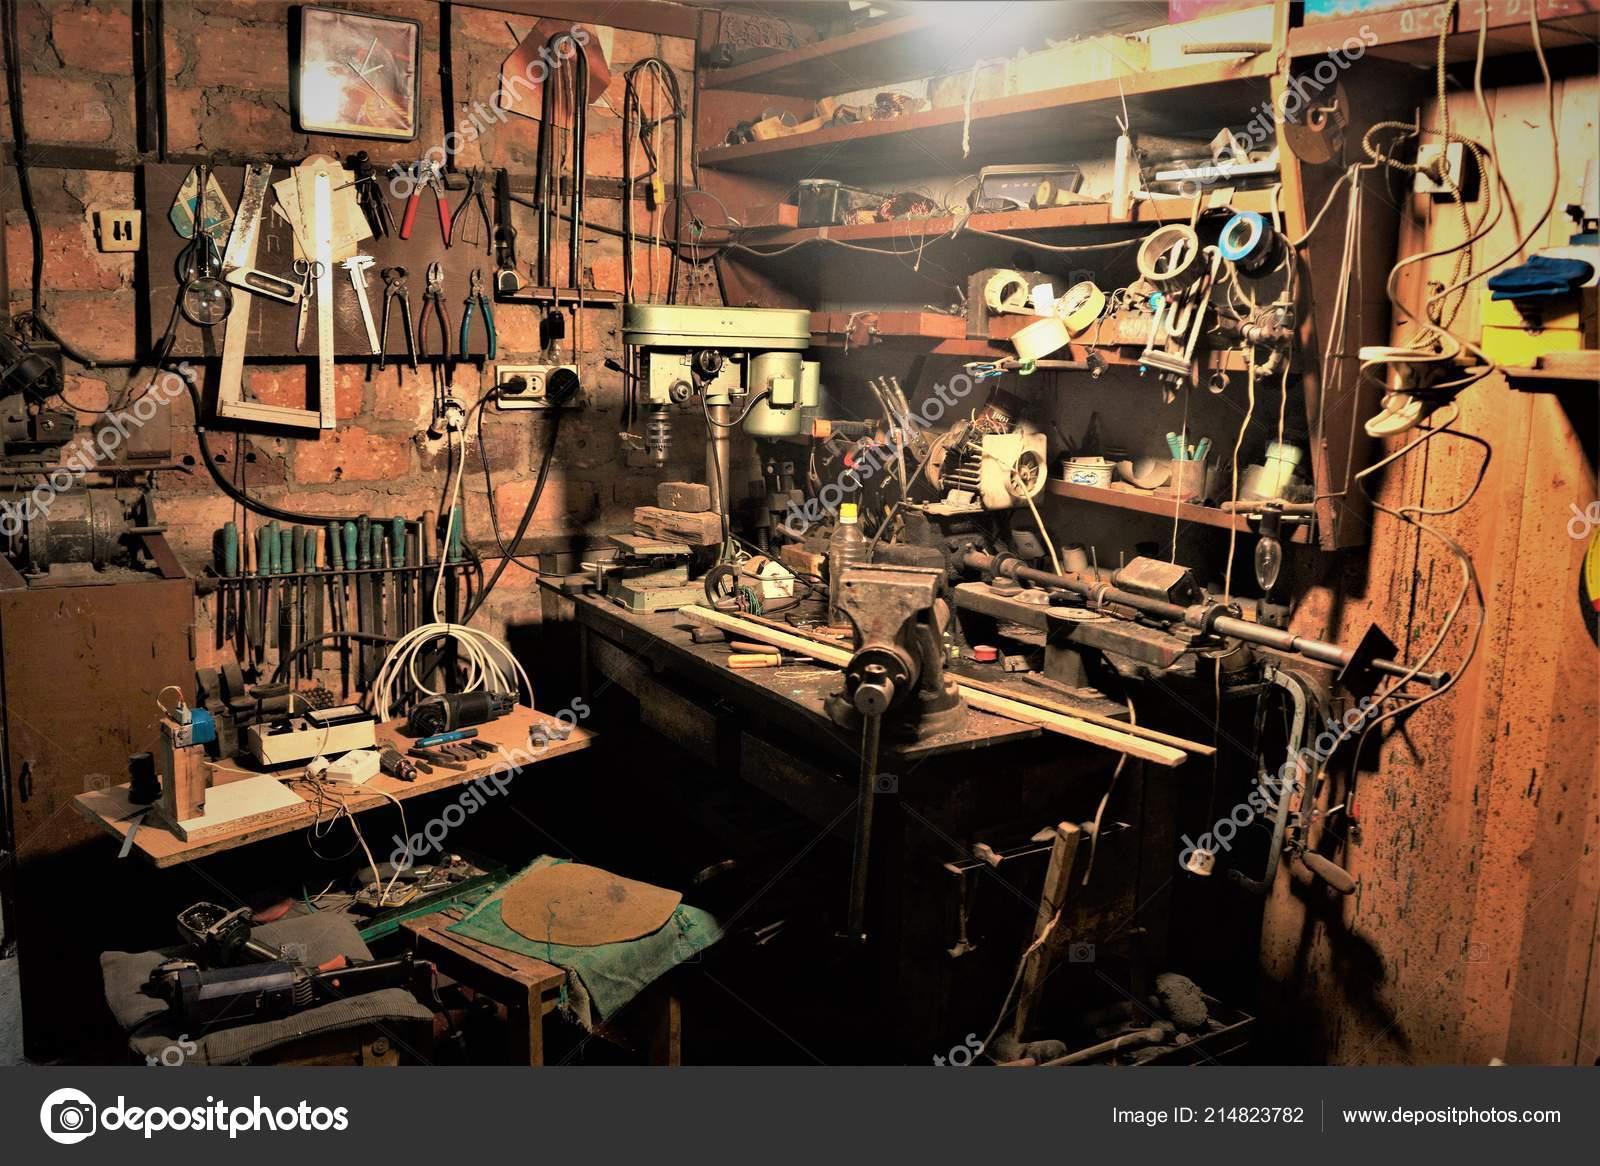 Desktop And Tools In The Garage Workshop Stock Photo C Sonymoon